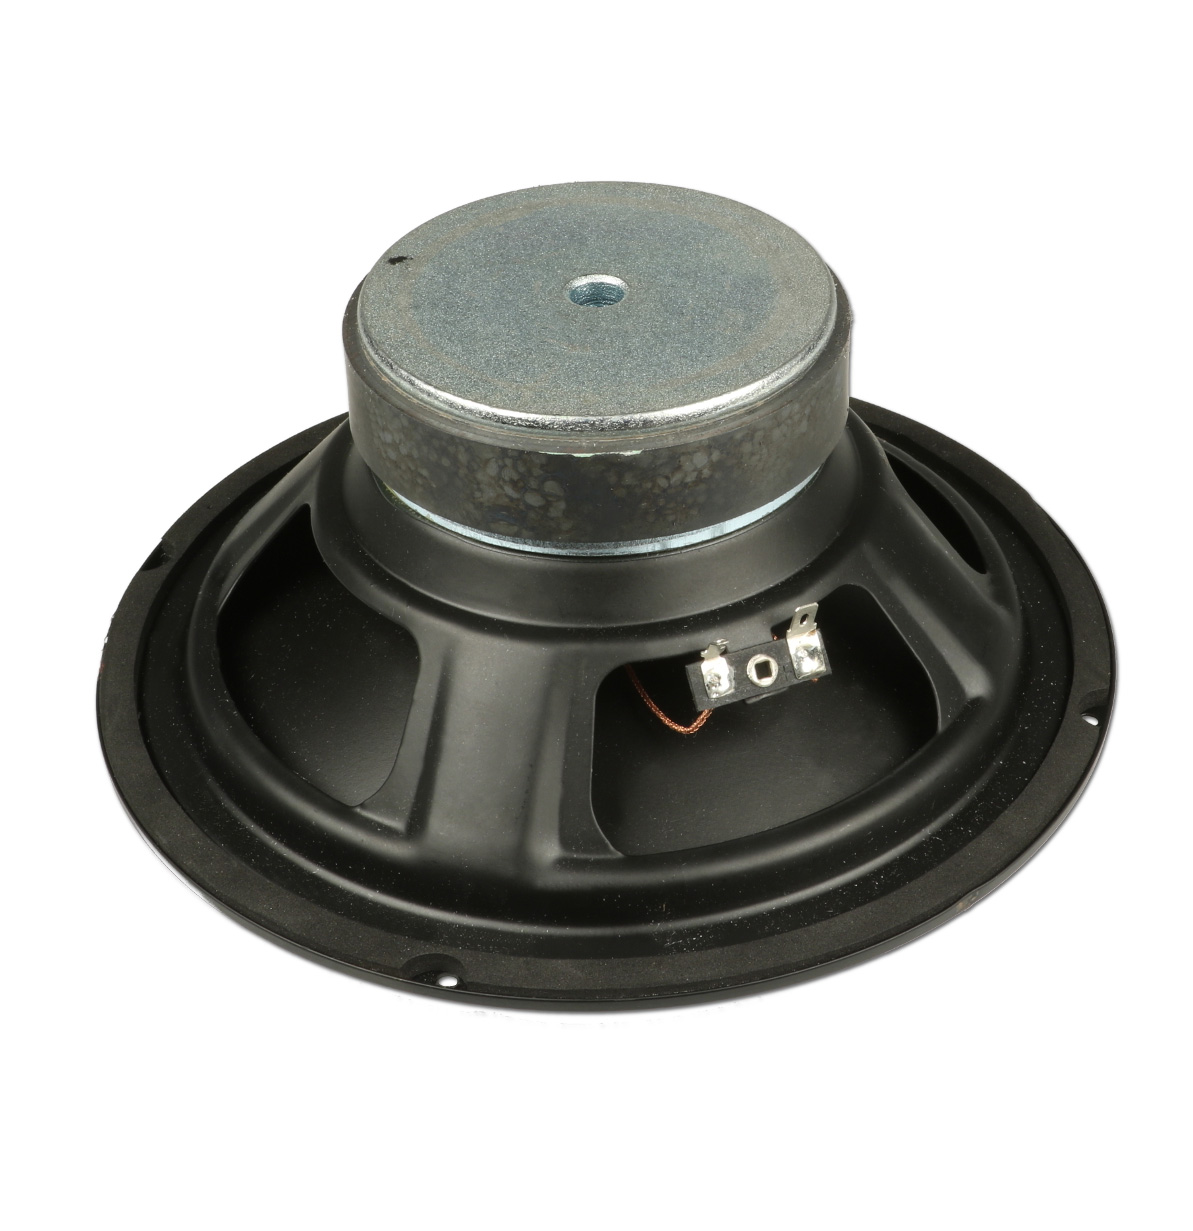 WOOFER MACKIE DB-2041680 (MR5 MK3)